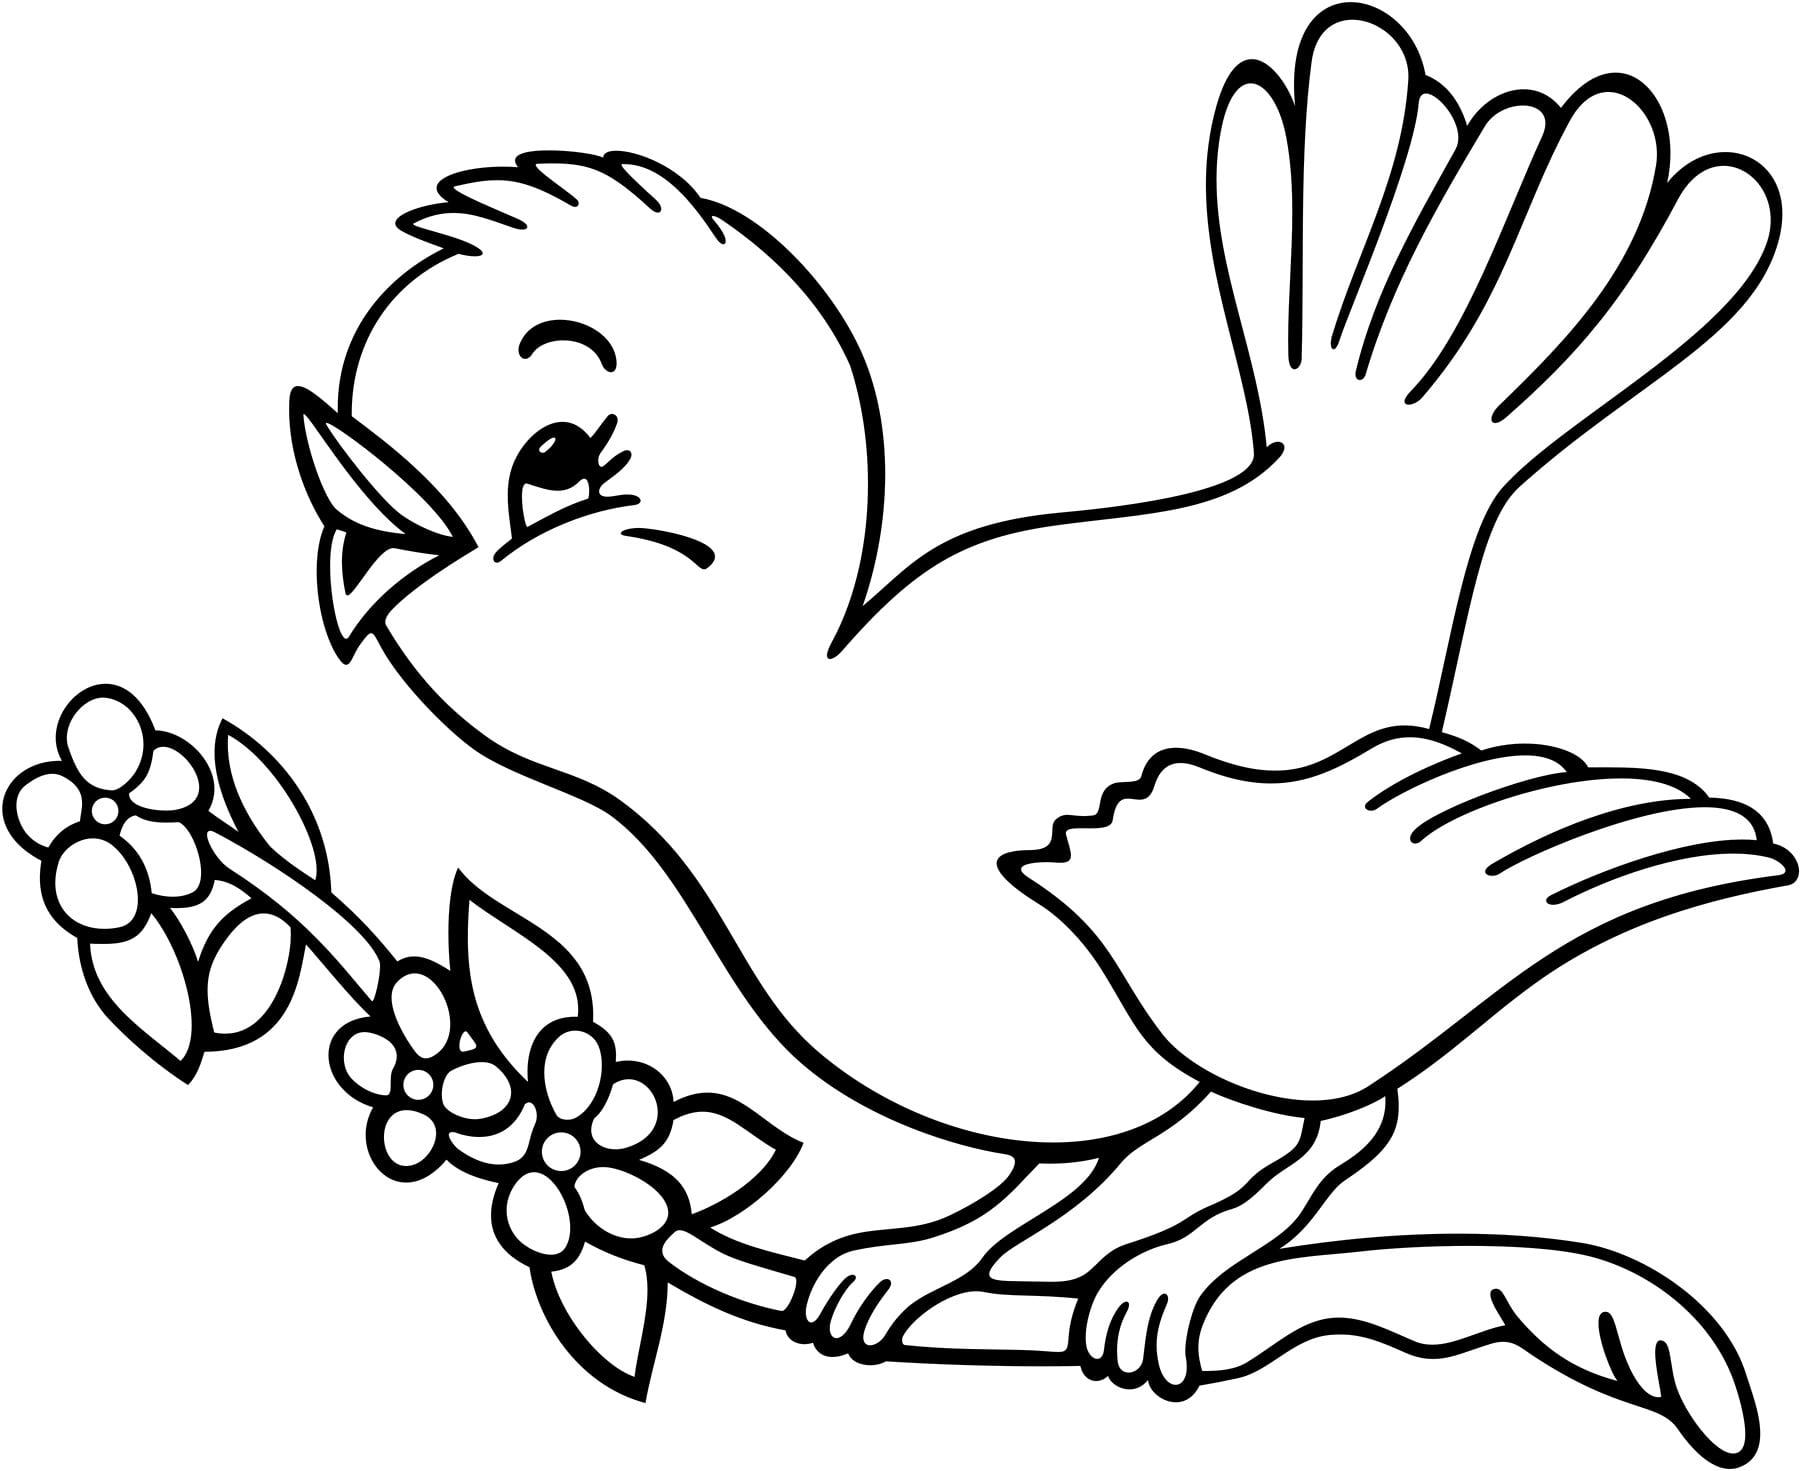 Highest Bird Color Sheet Coloring Book 26460 S  2817